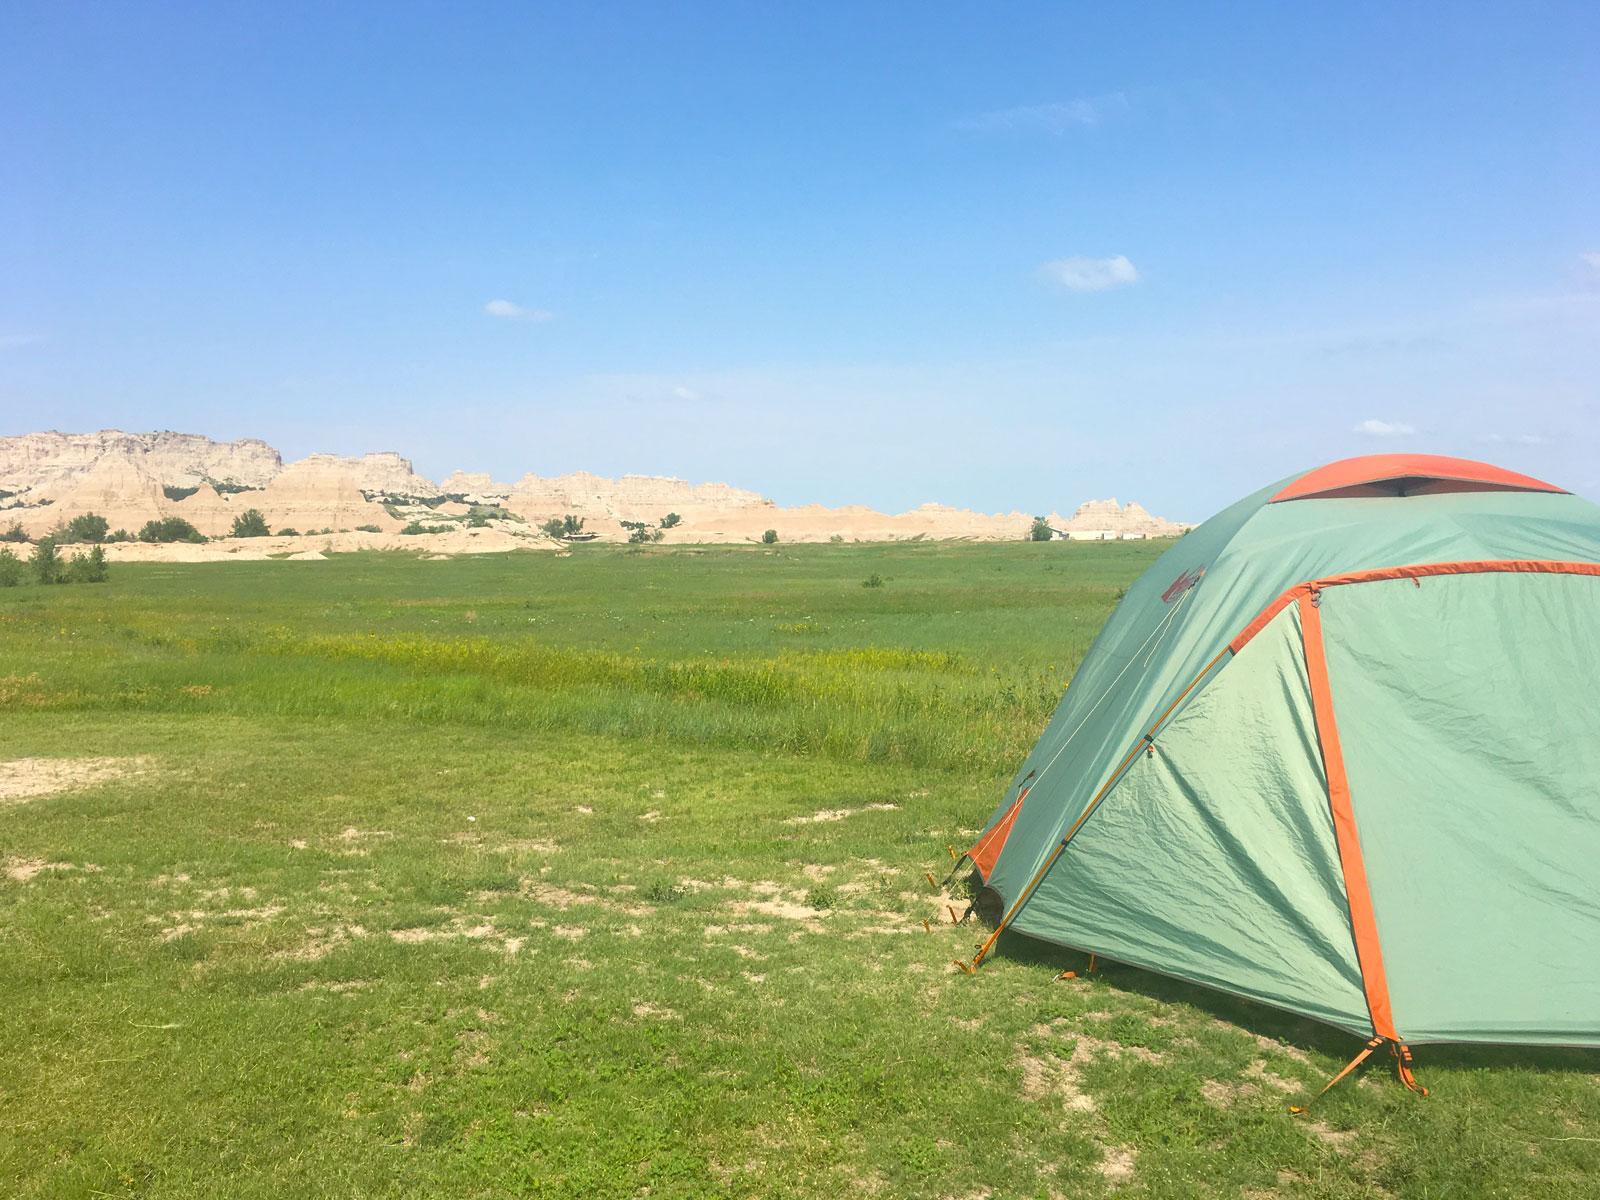 REI Basecamp 6 tent at Cedar Pass Campground in Badlands National Park, South Dakota